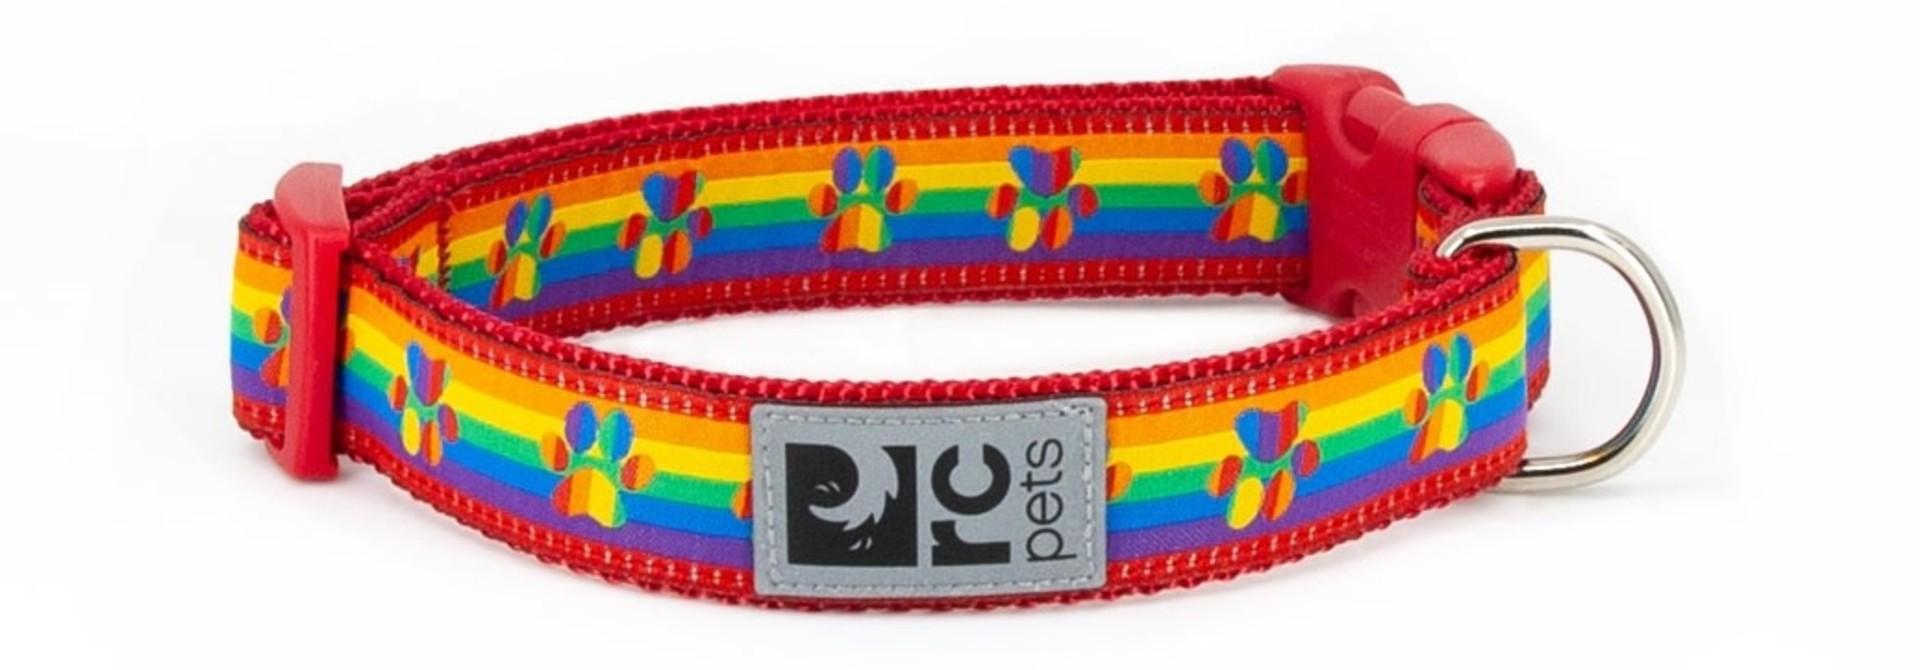 "Clip Collar Large 1"" Rainbow Paws"